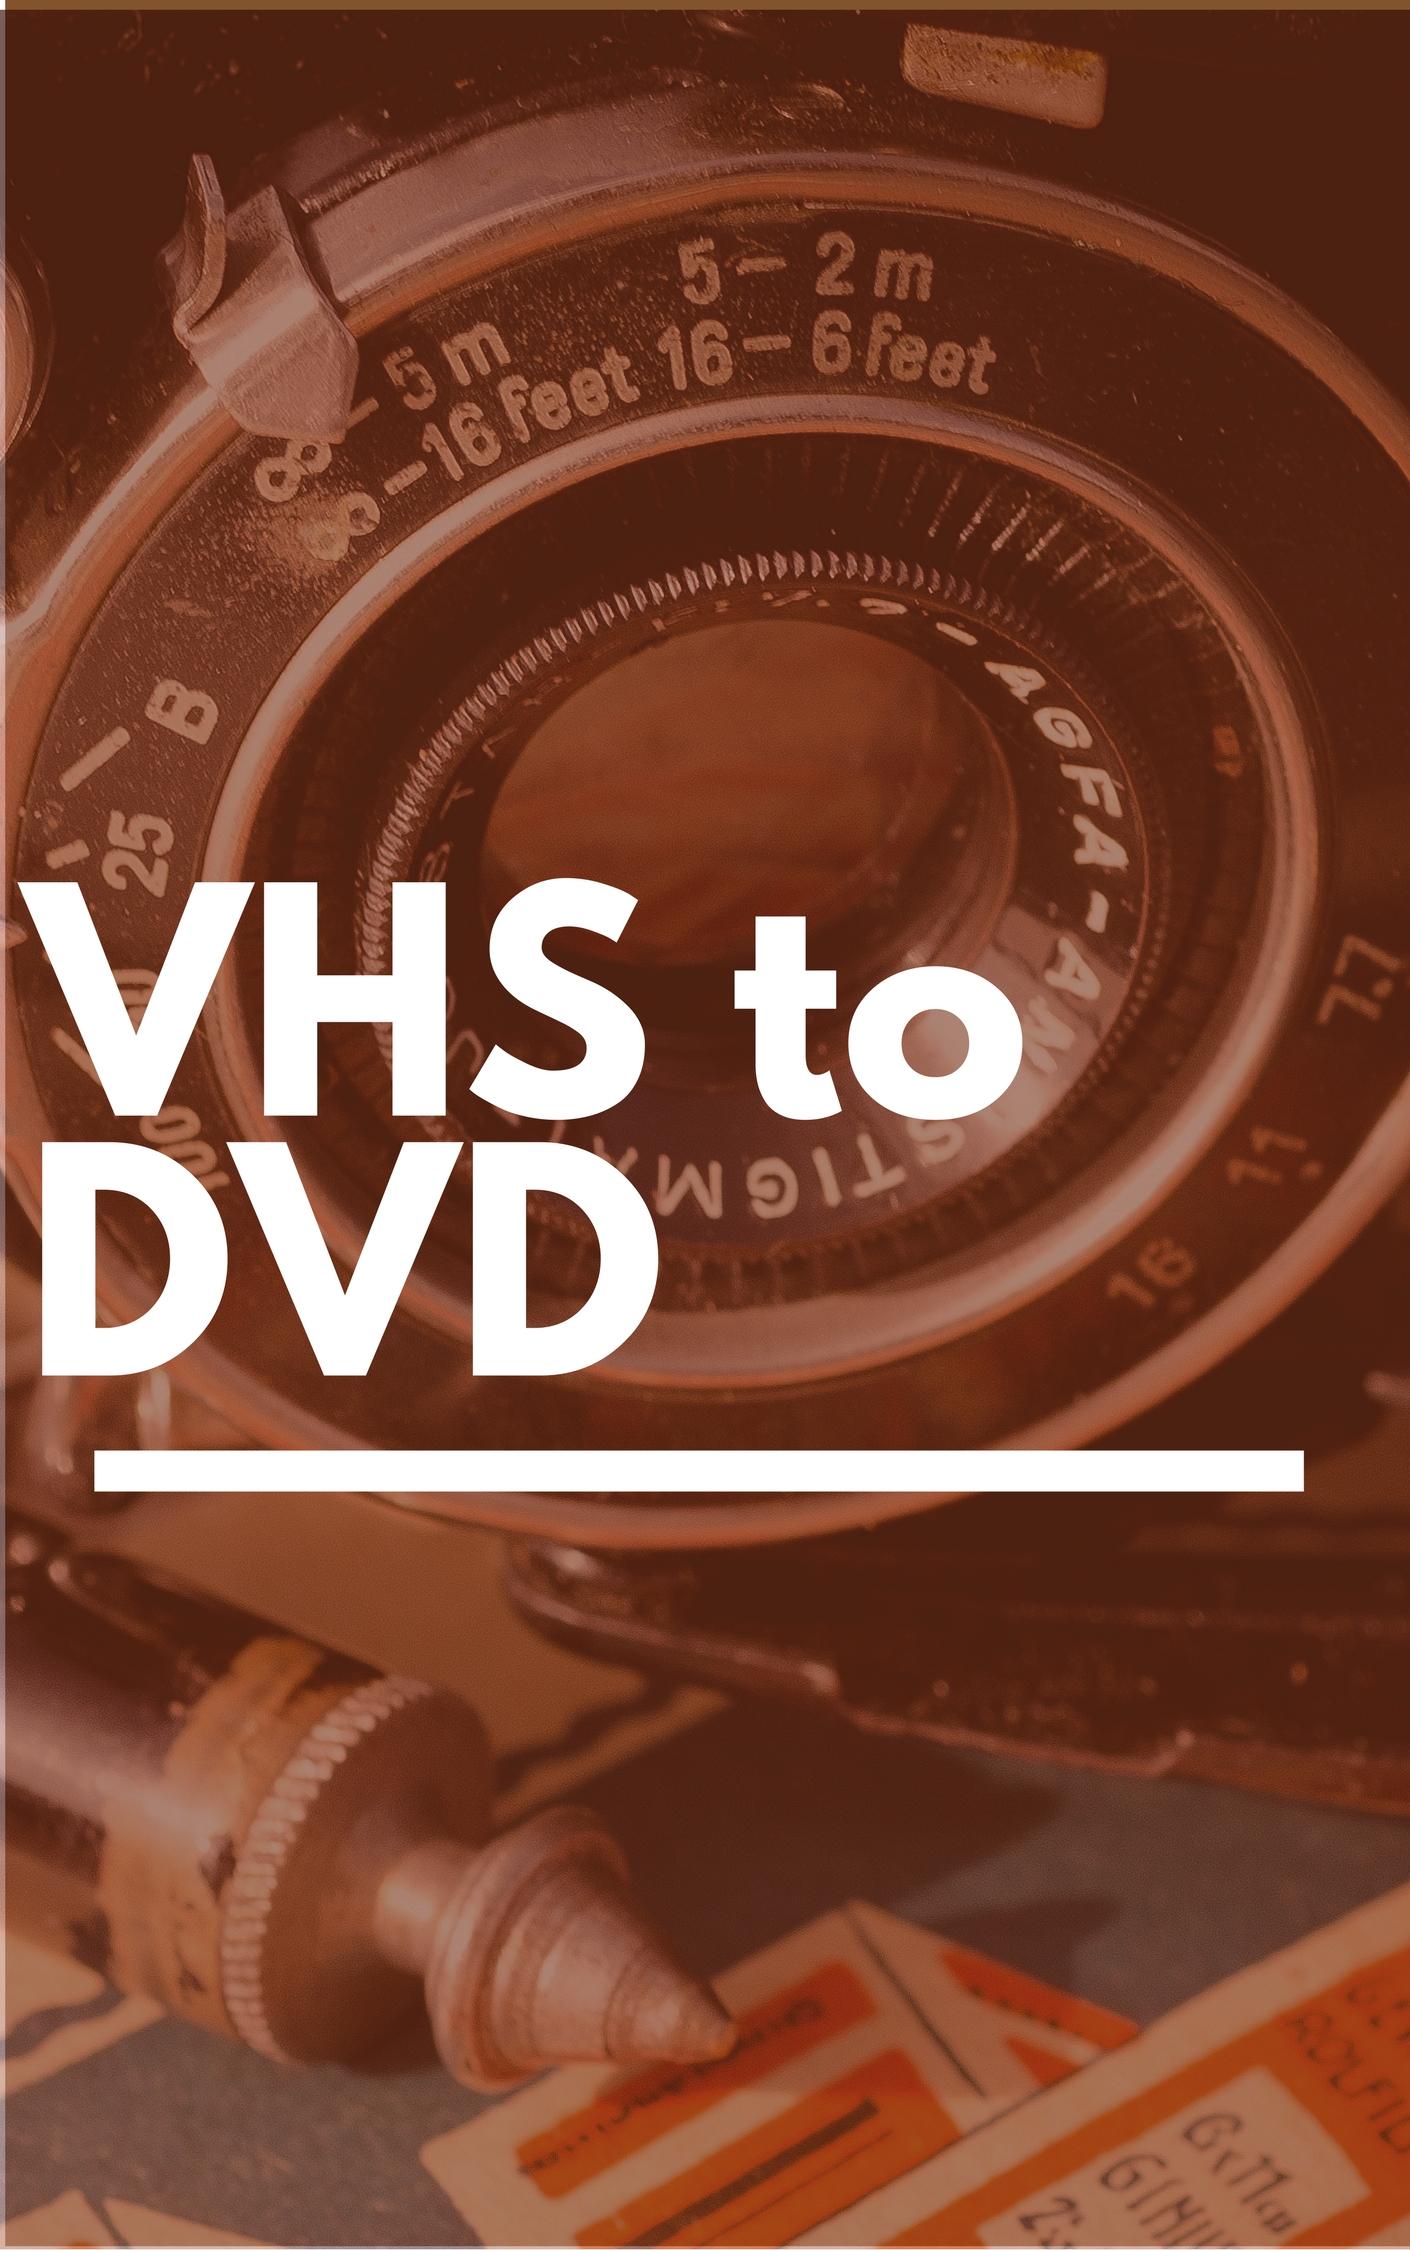 VHS to DVD conversion - Glen Rock Public Library - NJ